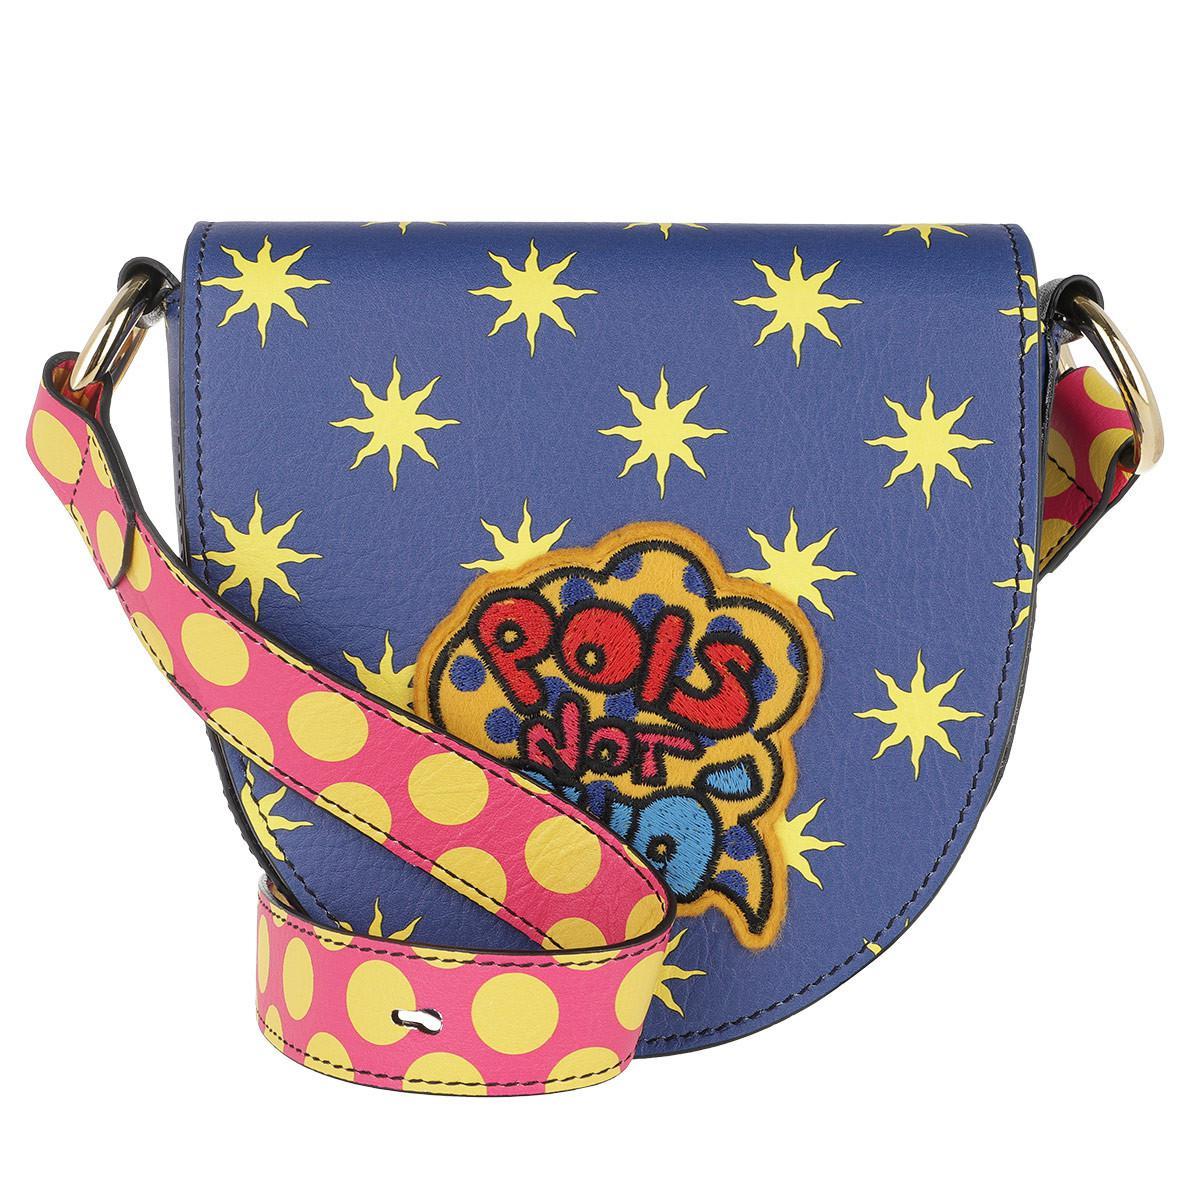 b112d328426 Alessandro Enriquez Mini Hebe Pop Pois Crossbody Bag Stars Multi in ...